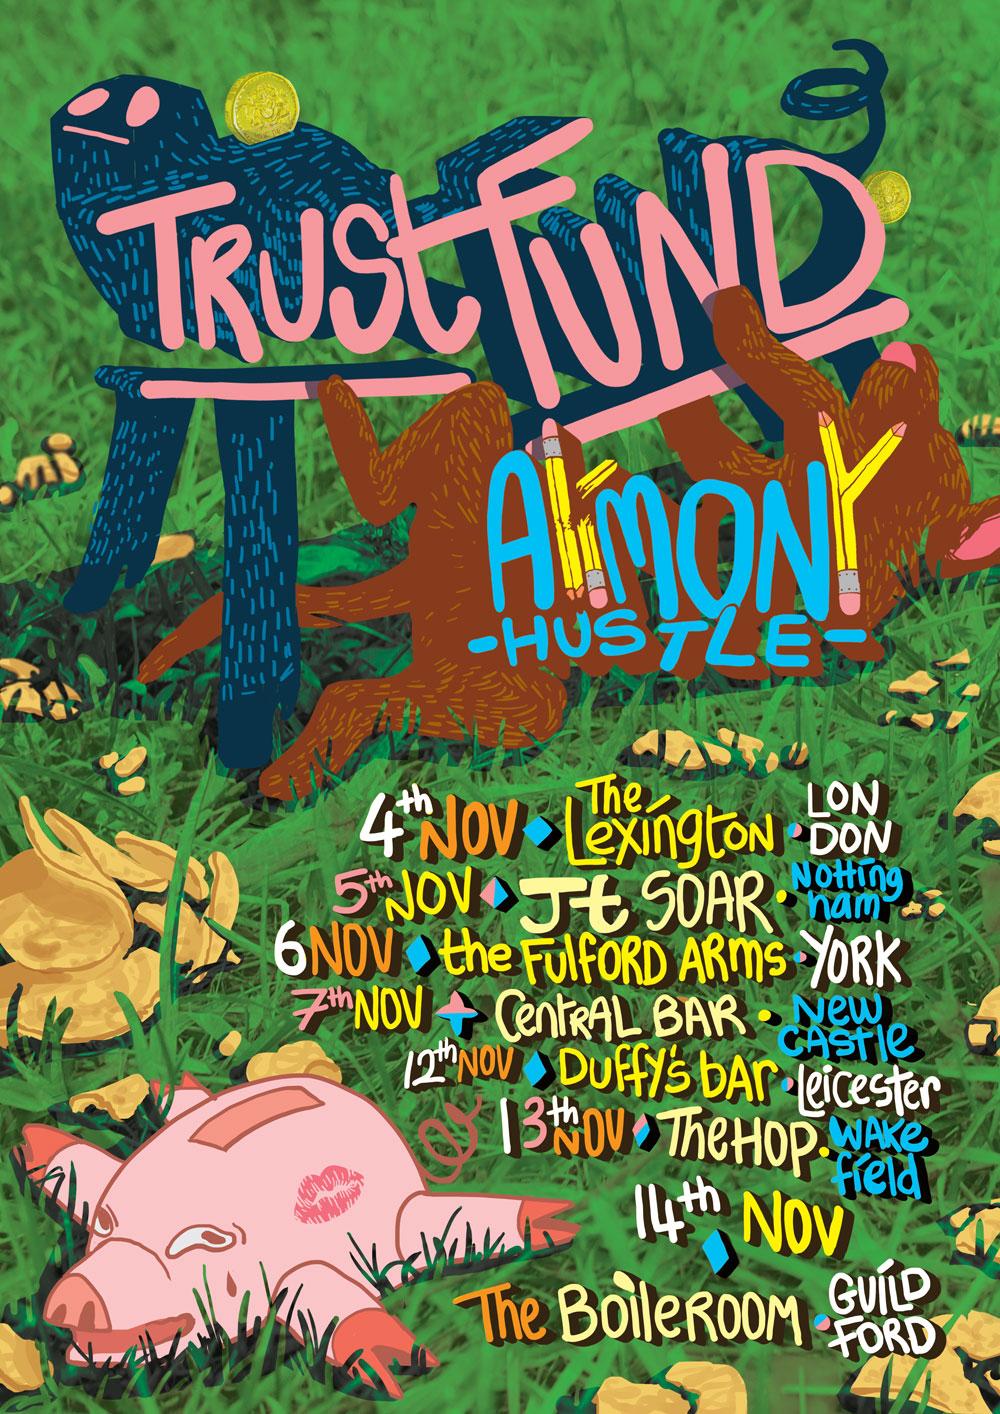 Tour Poster Design / 2015